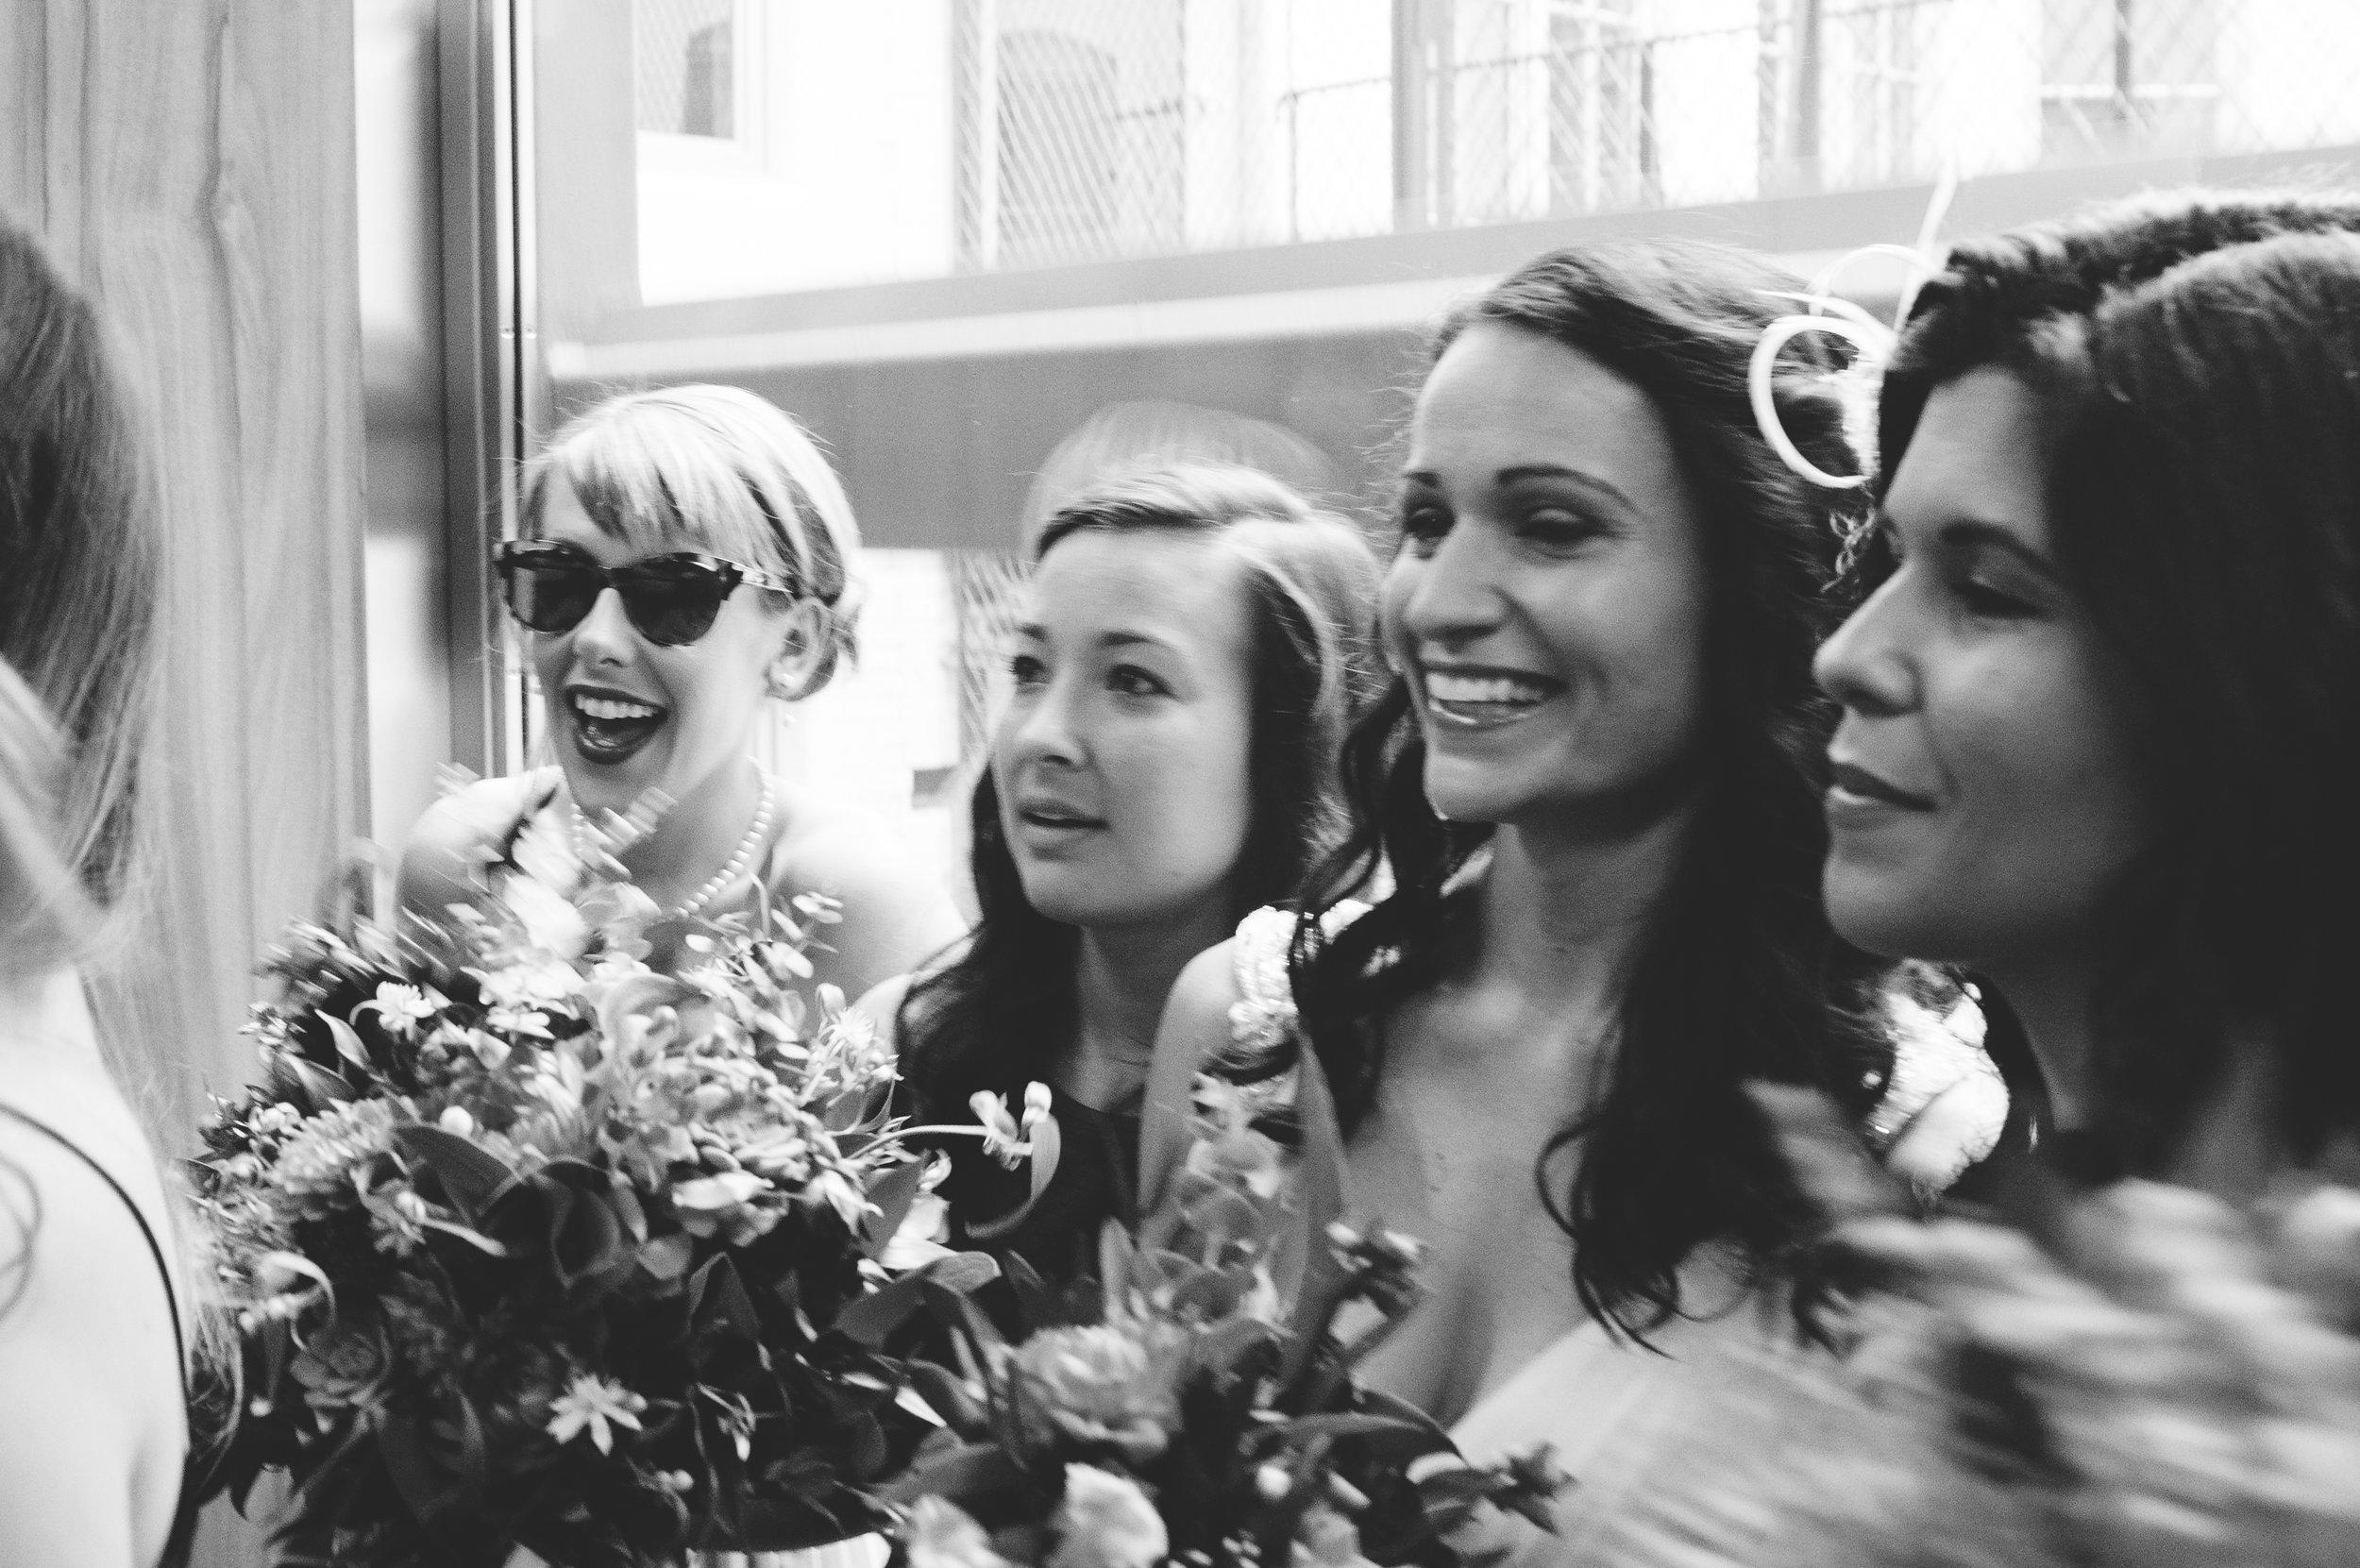 Weddings_BradRaquel_©meghanireland2016_19.jpg